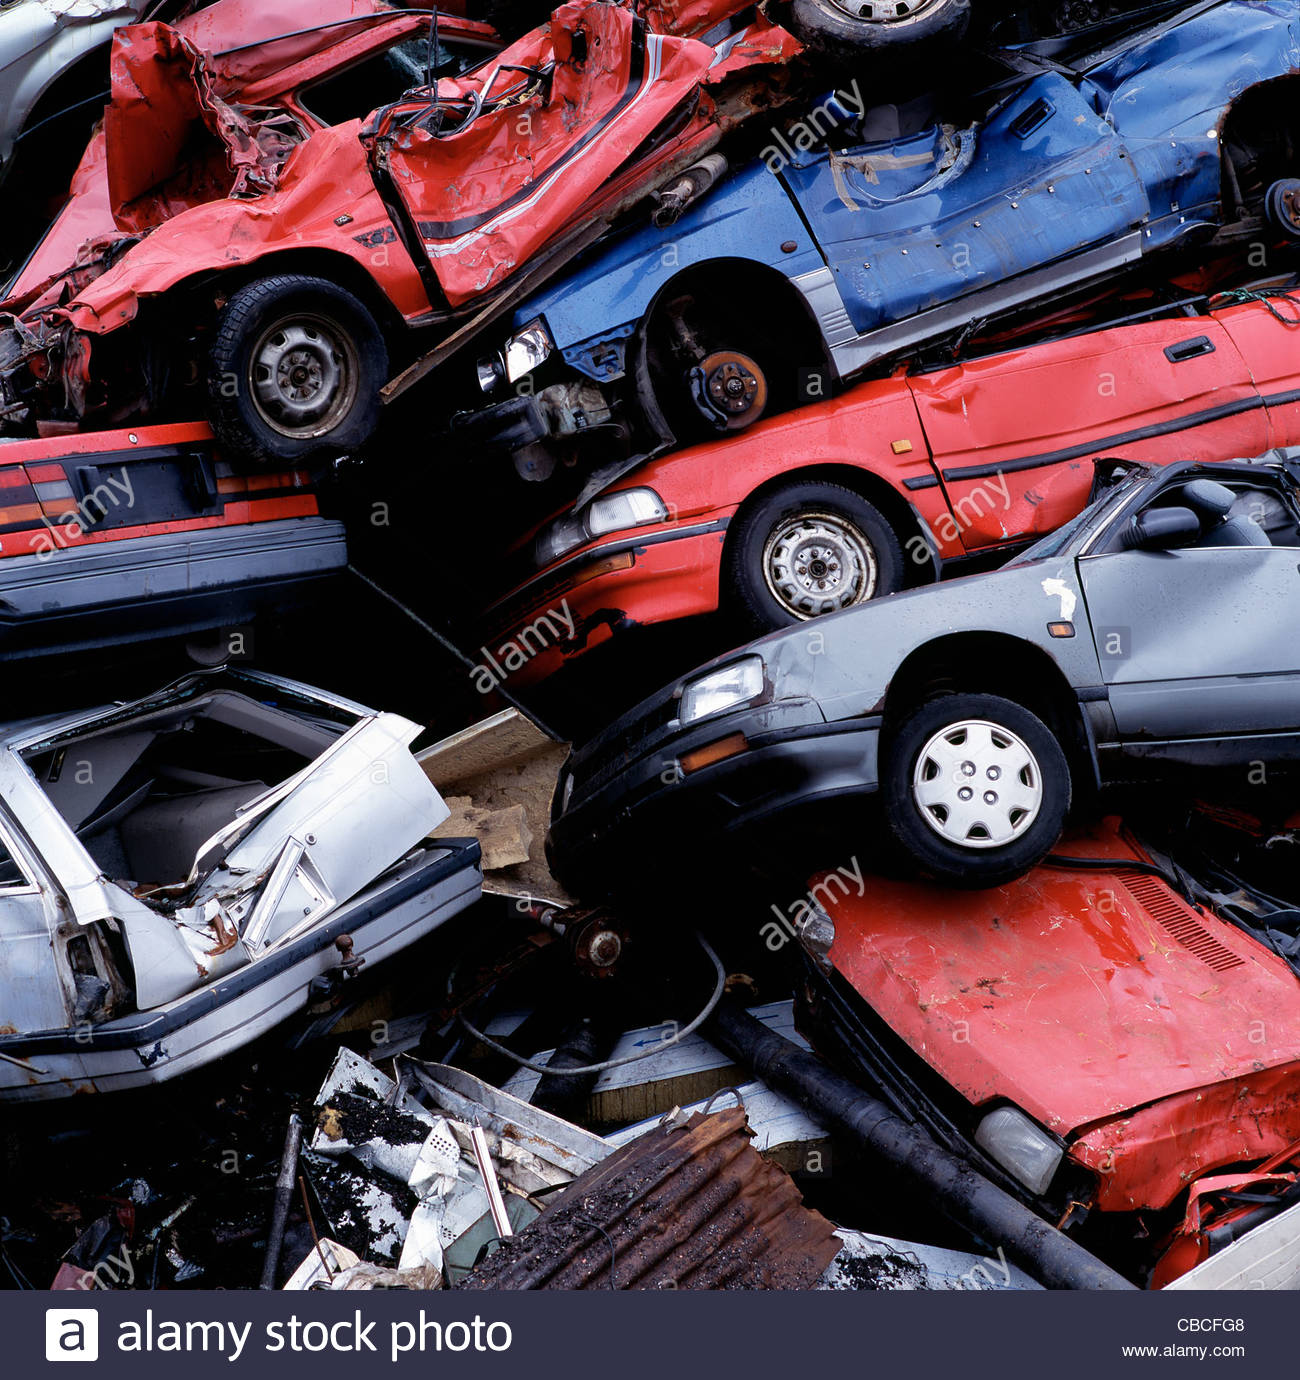 Wrecked cars in pile at junkyard Stock Photo, Royalty Free Image ...